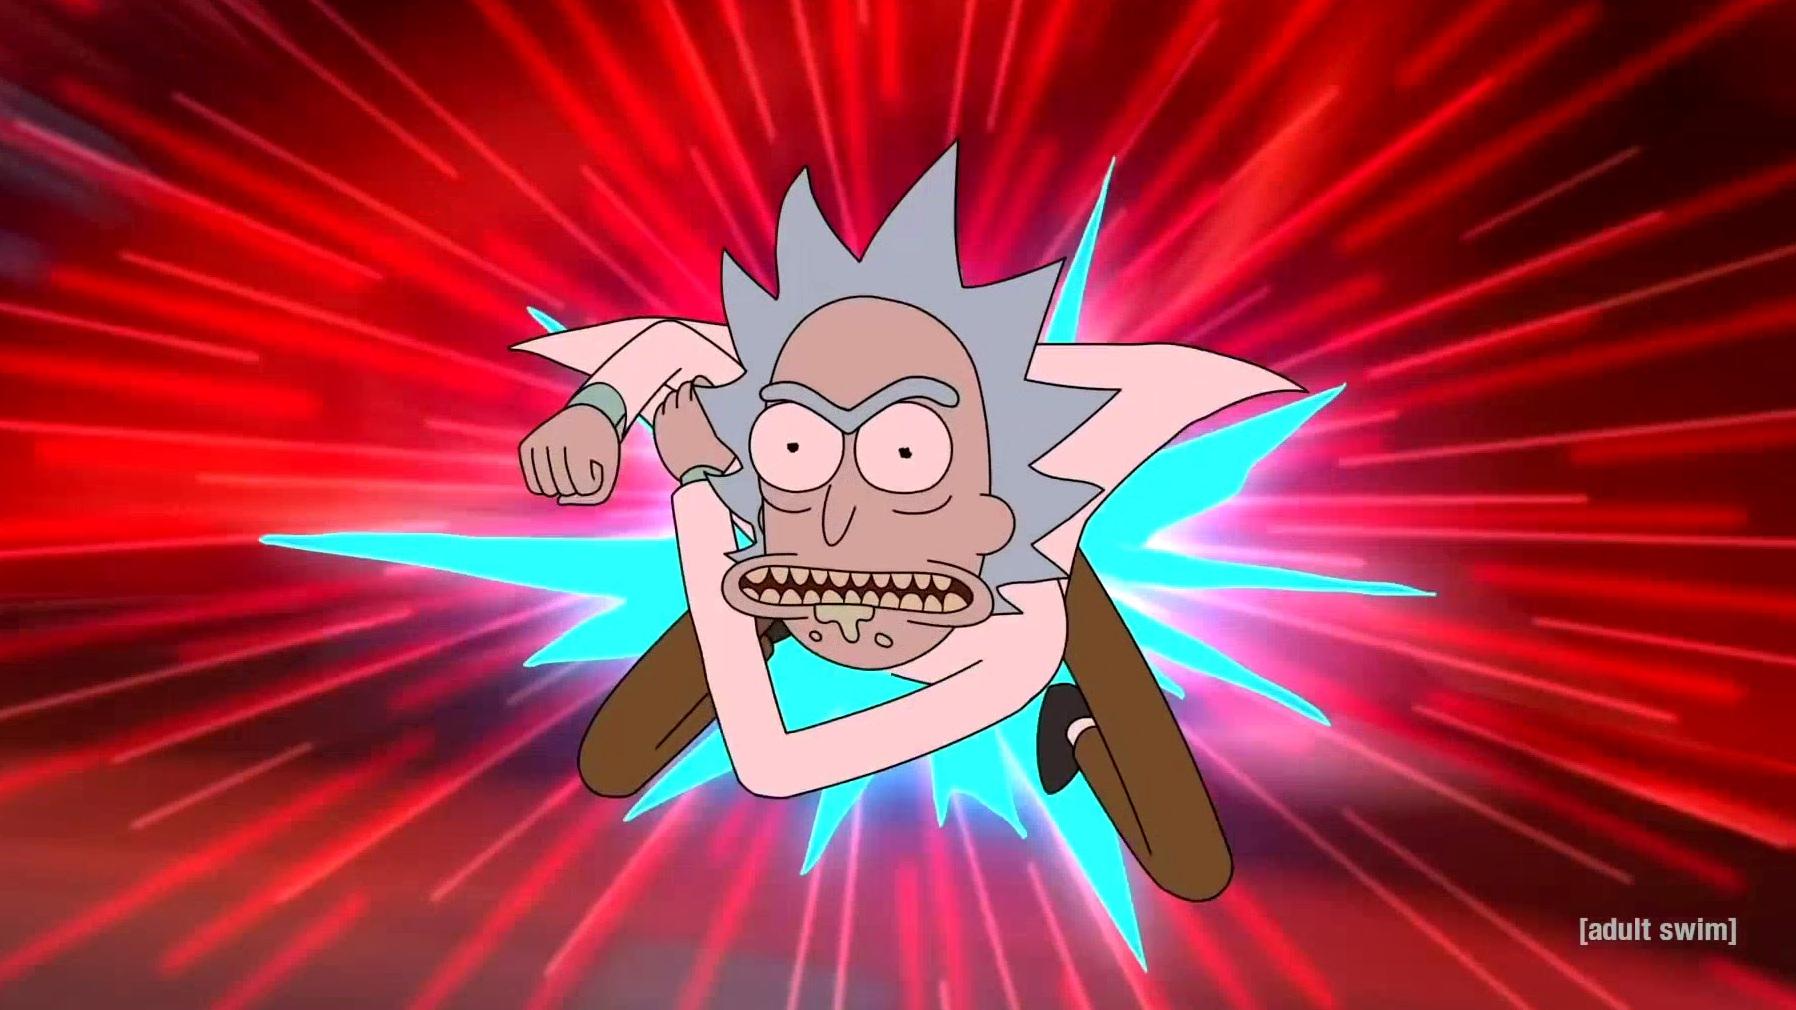 Rick and Morty: Phoenix Person fka Bird Person